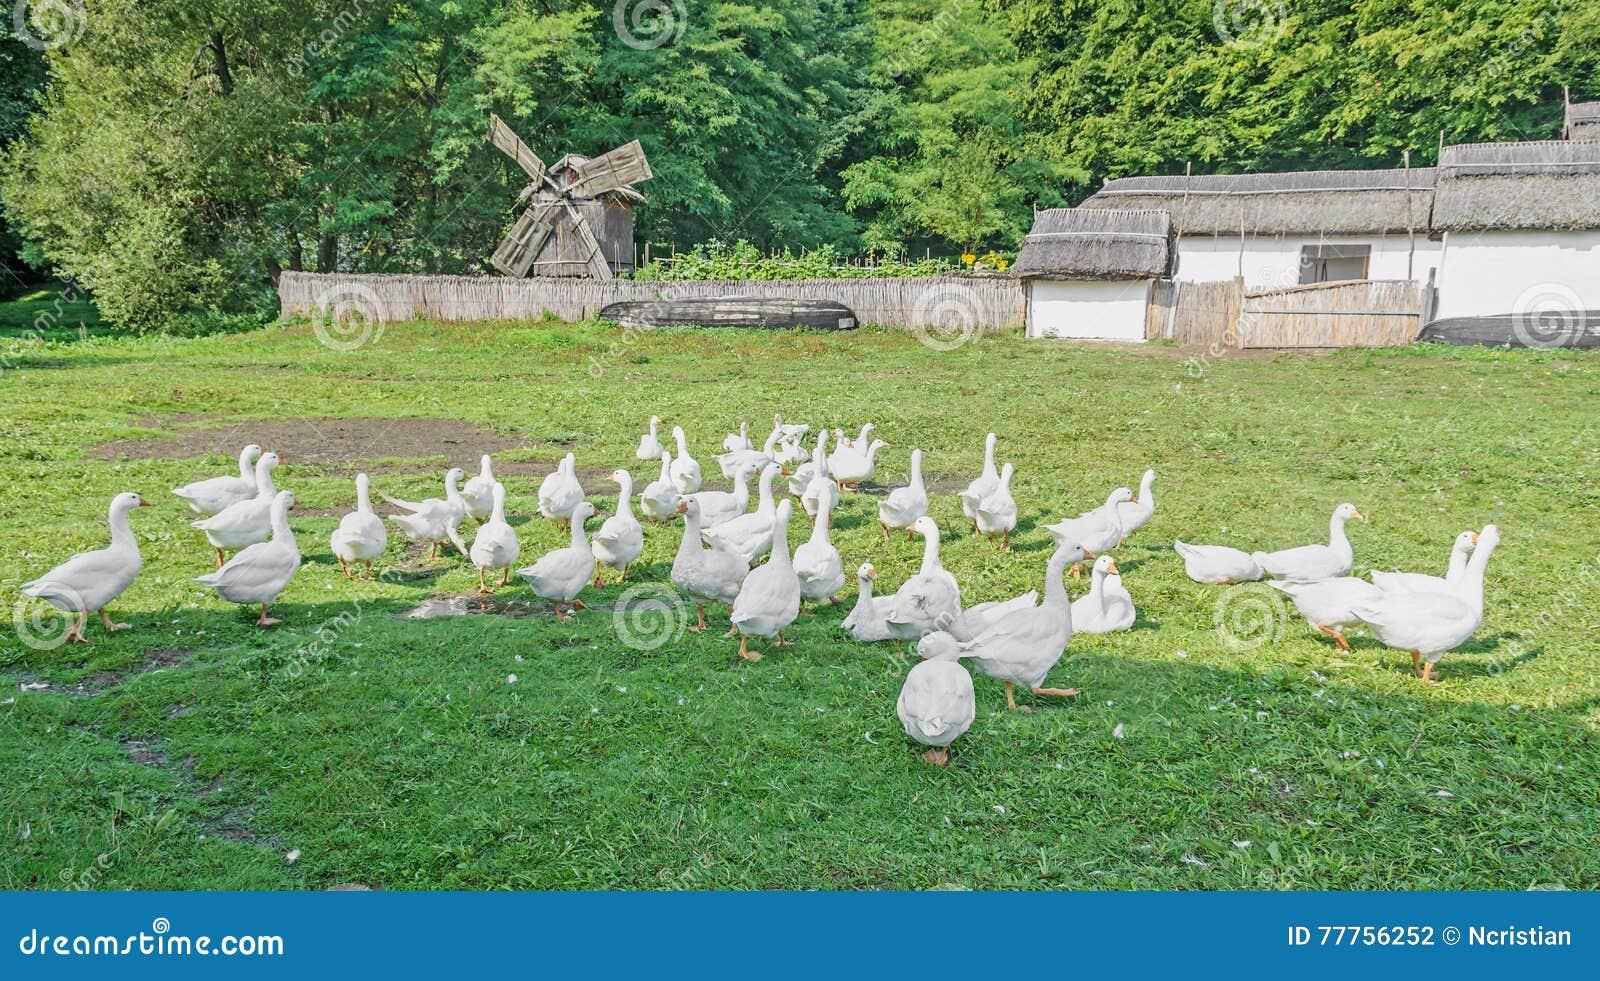 White geese with orange beak on green grass, close up